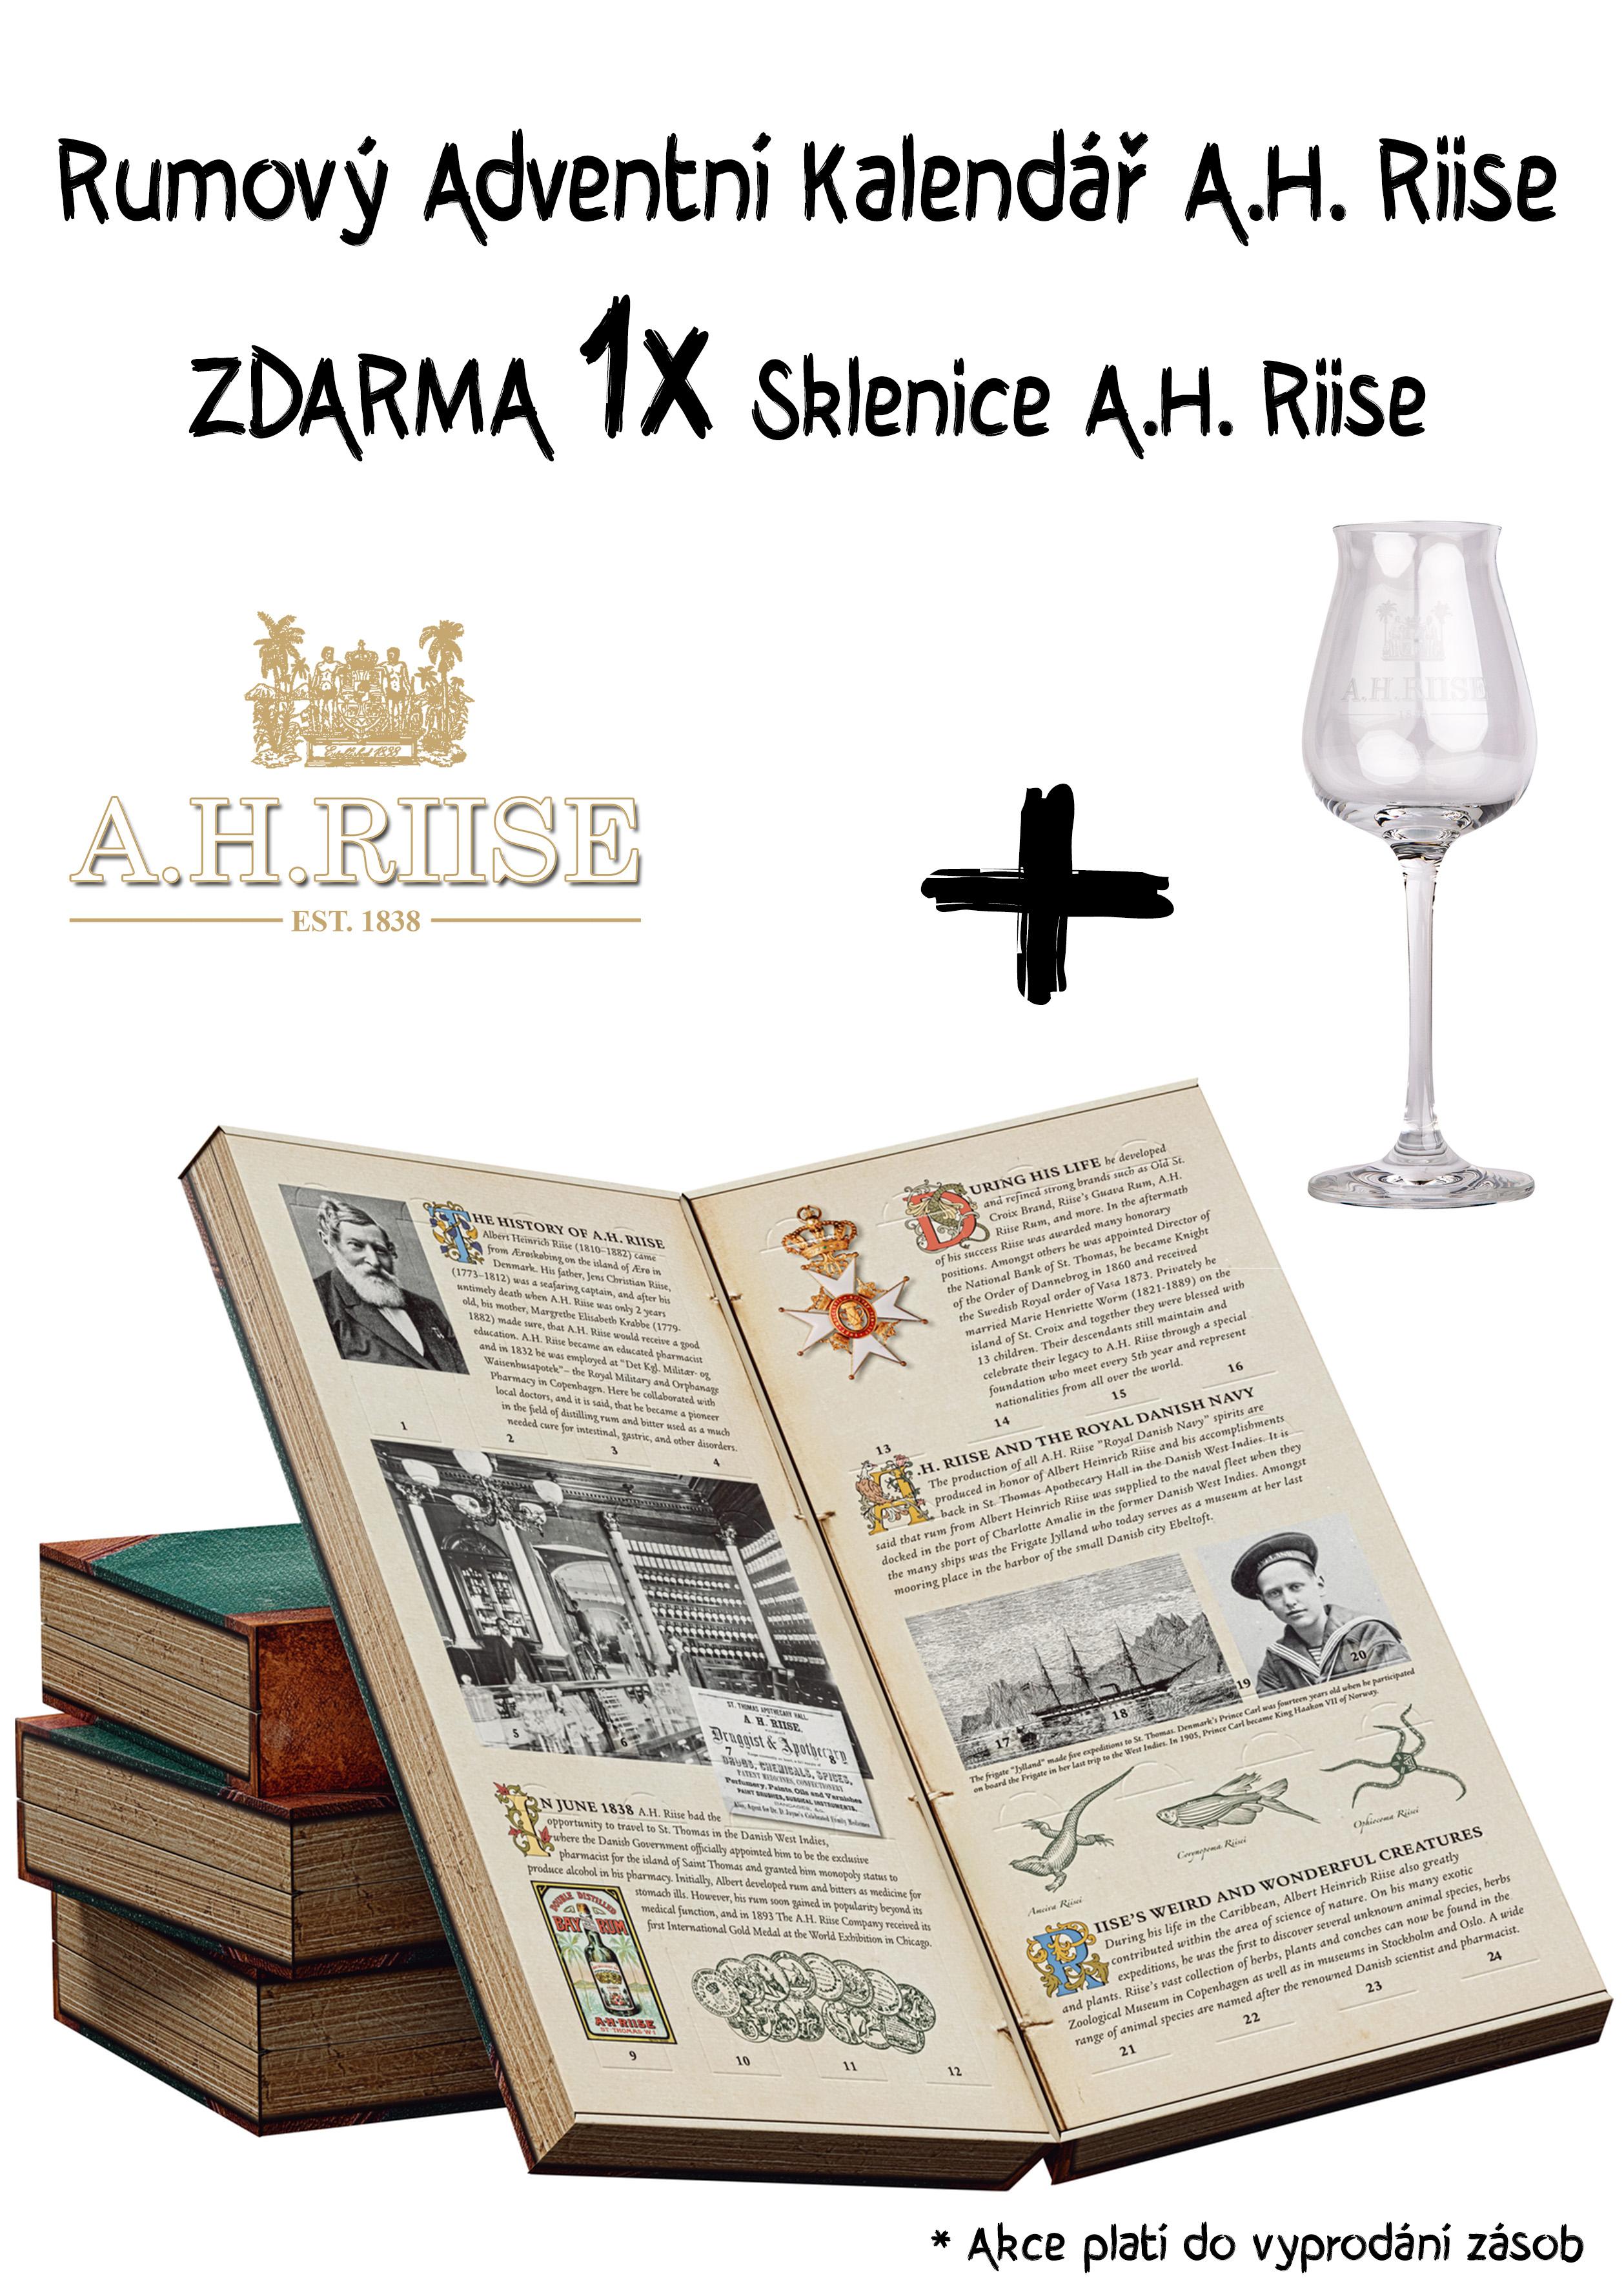 a-h-riise-rumovy-adventni-kalendar-2020